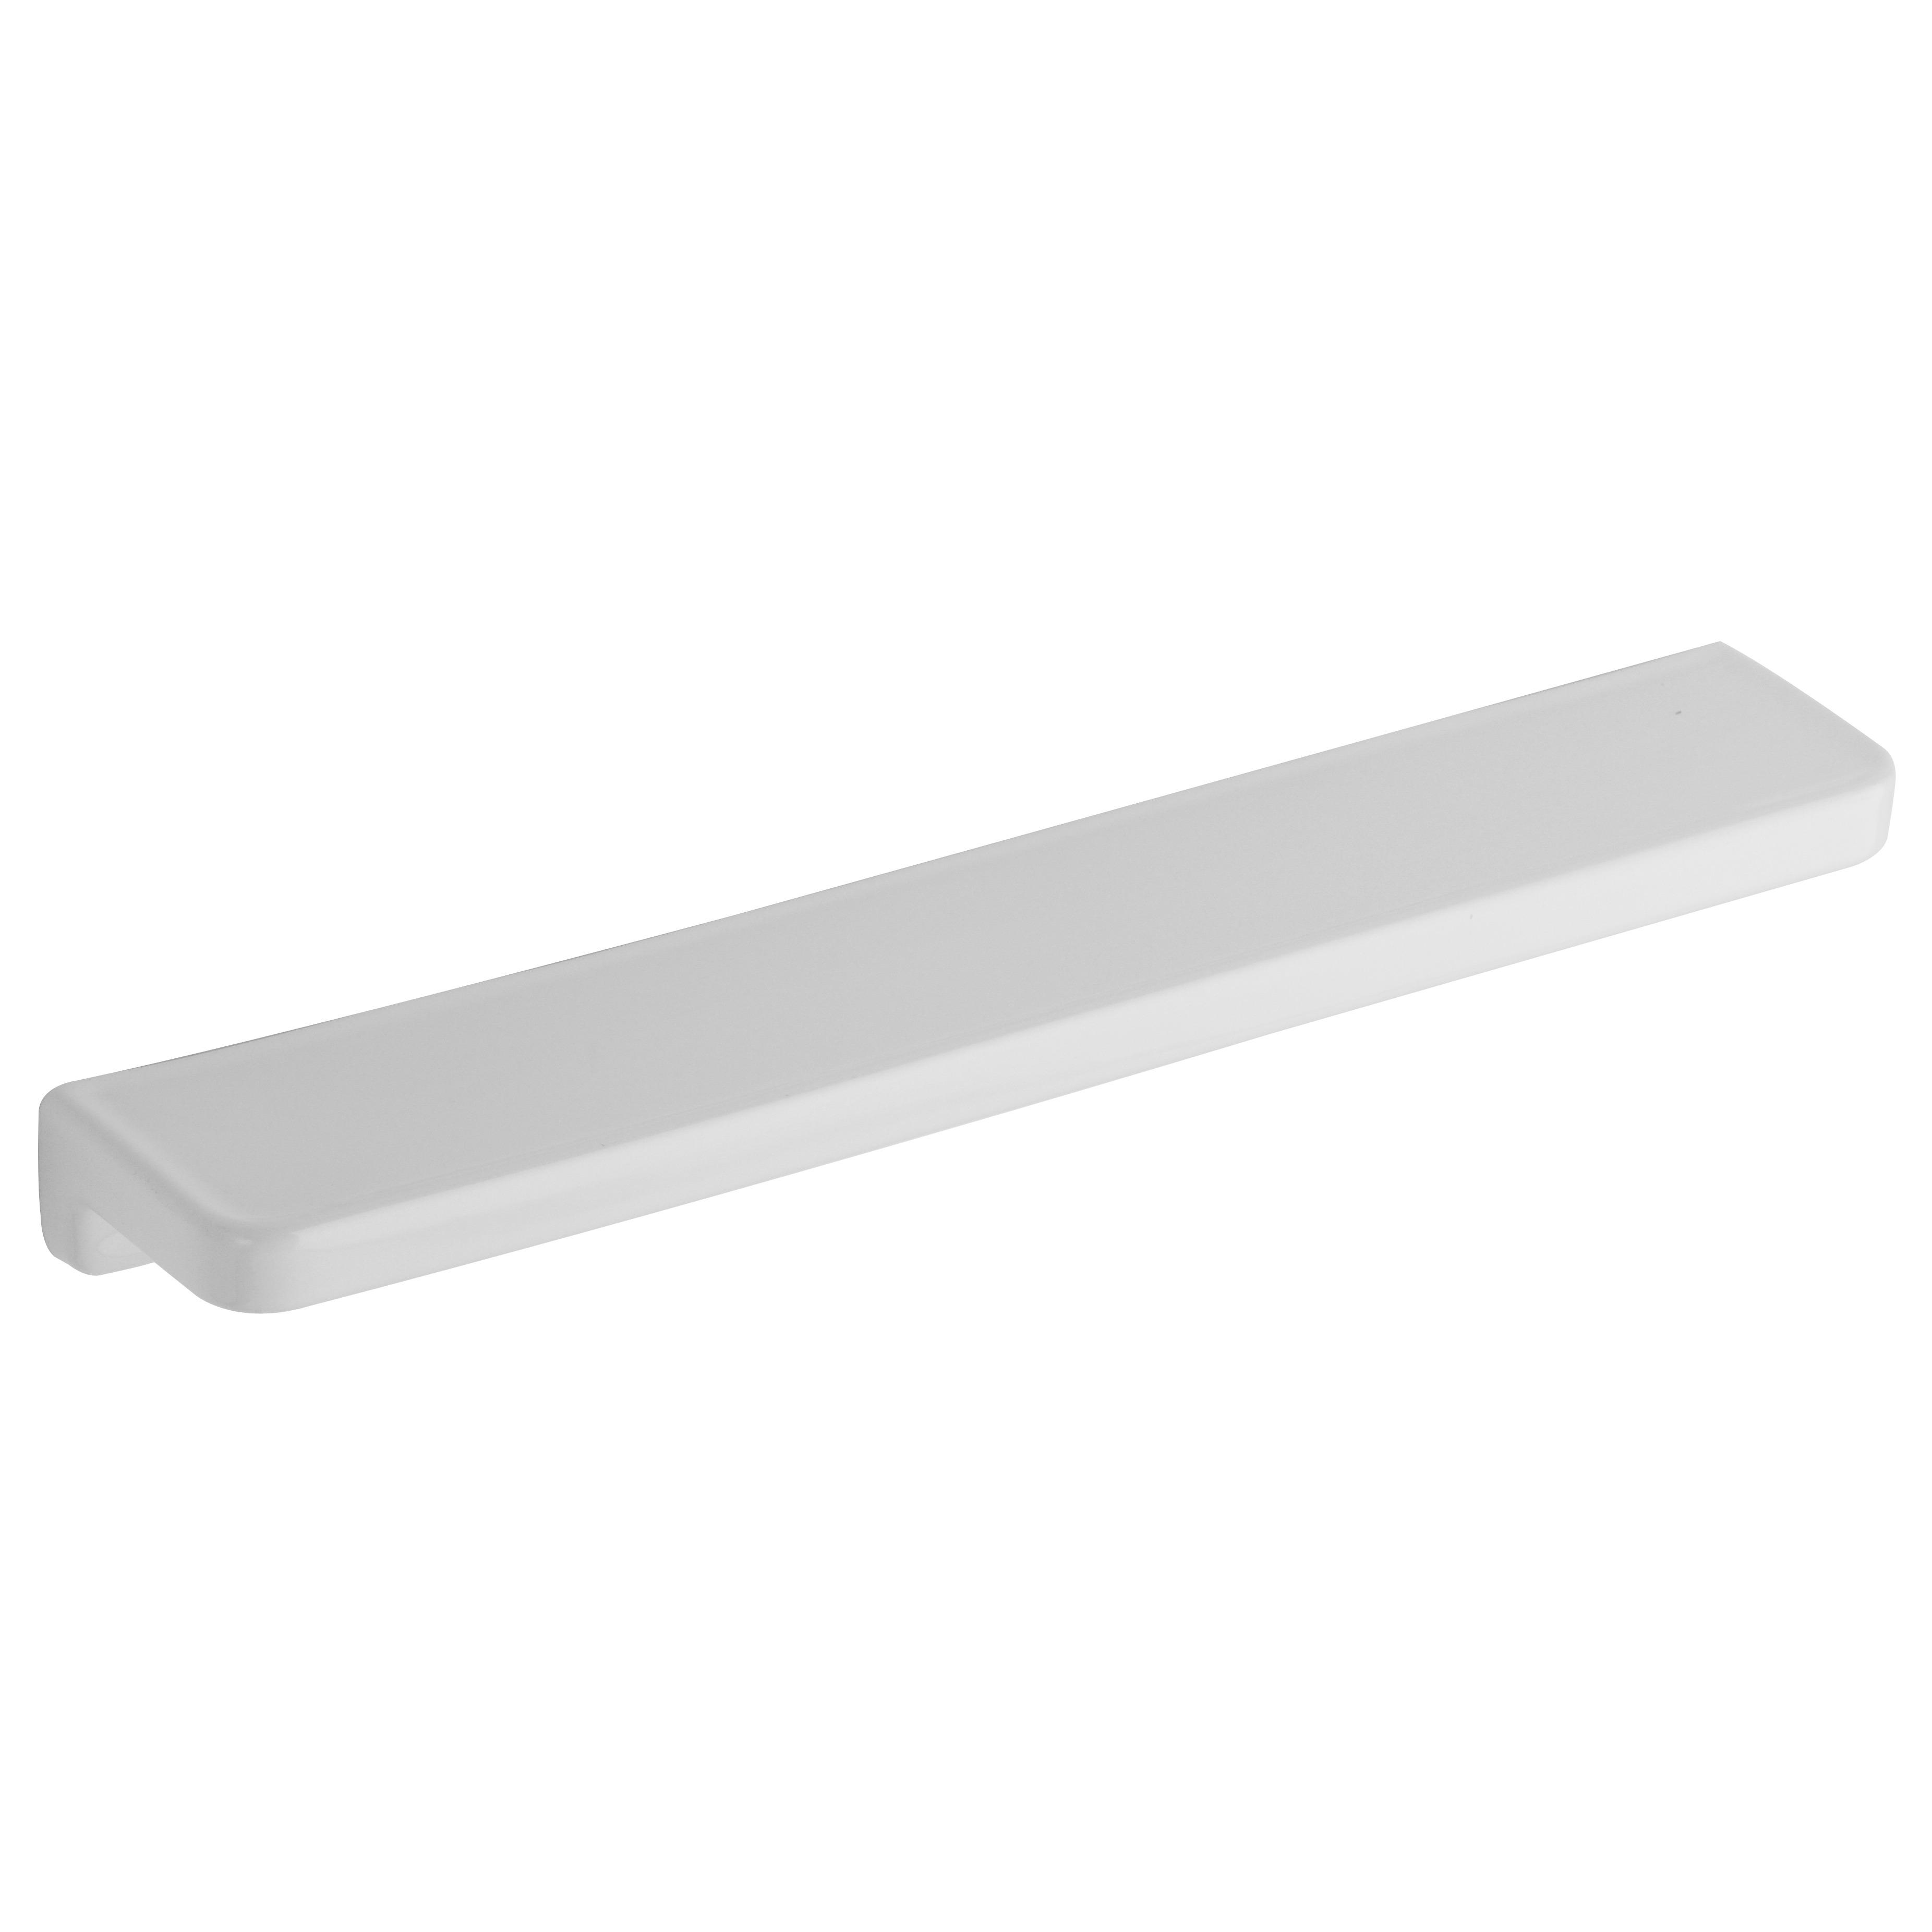 Sphinx Serie 300 basic planchet 50 cm, wit